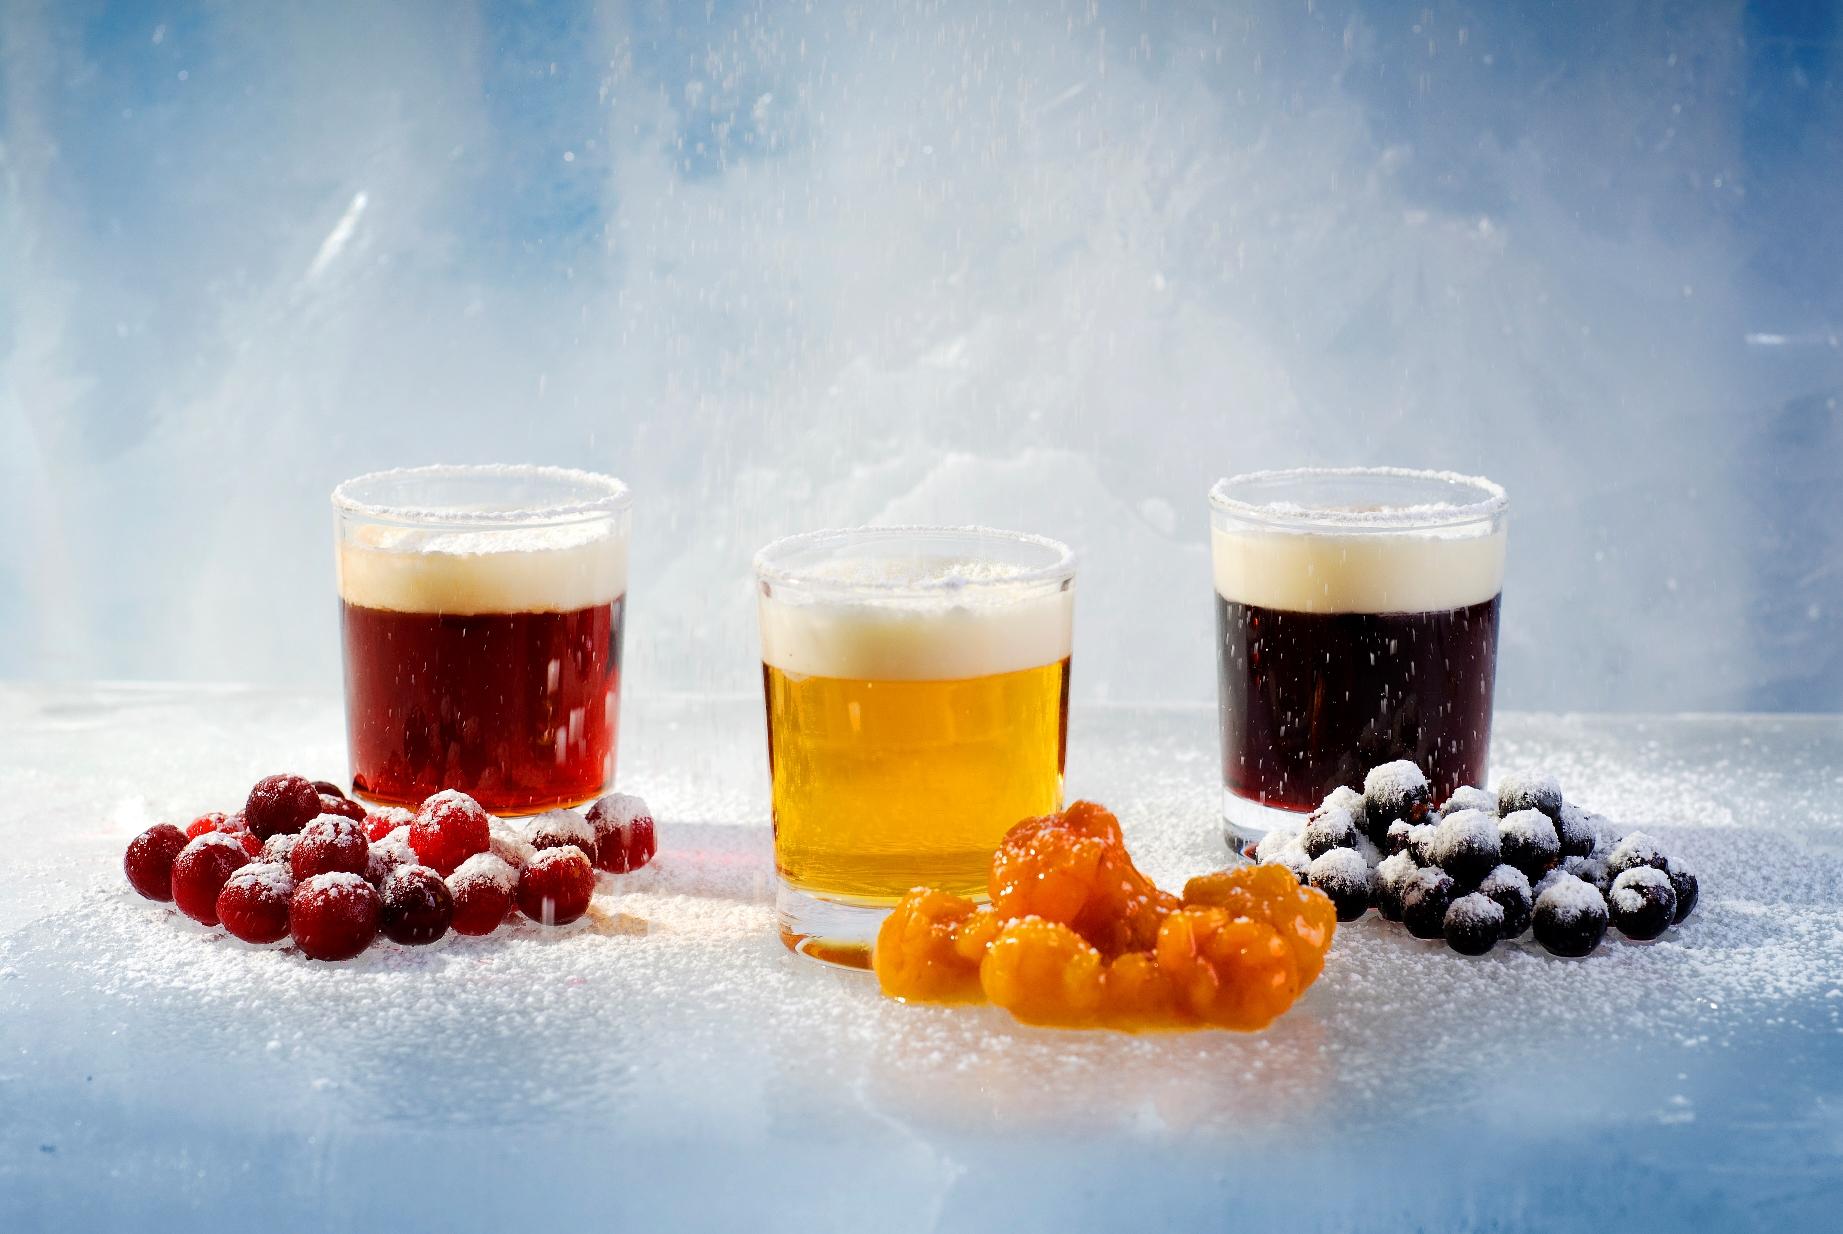 Nili berries (lingonberries, cloudberries, bilberries) | Image Courtesy of Nili Restaurant